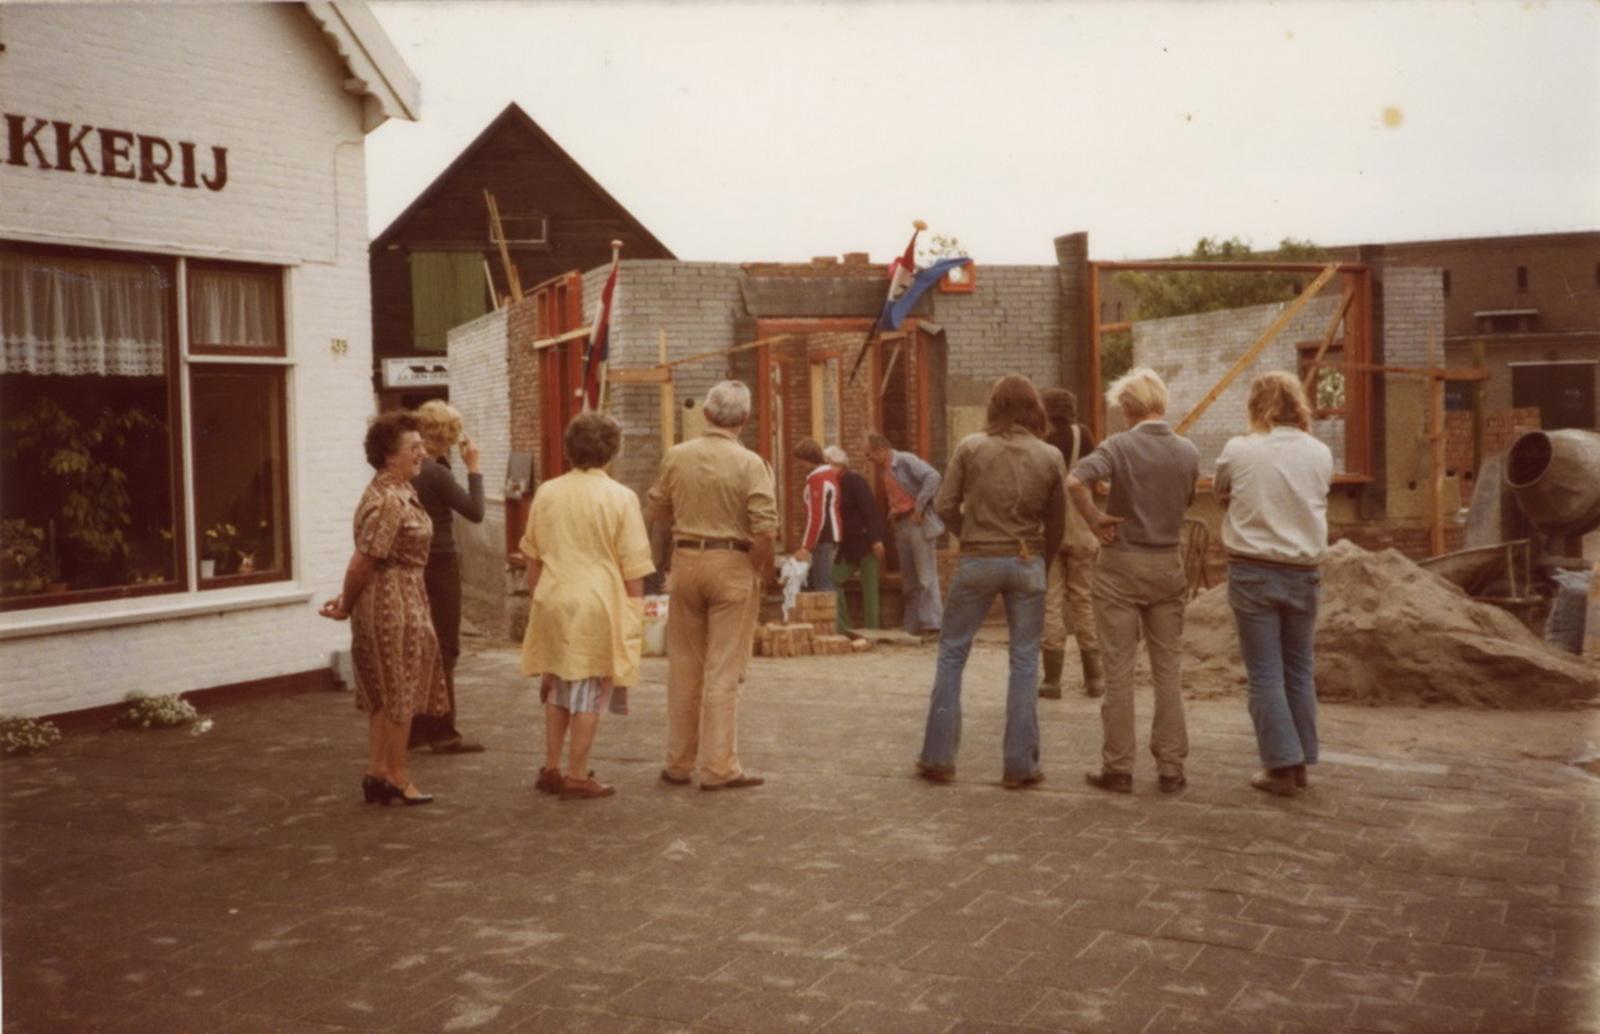 Marktplein N 0037 1978 Nieuwbouw huize aannemer den Ouden 06